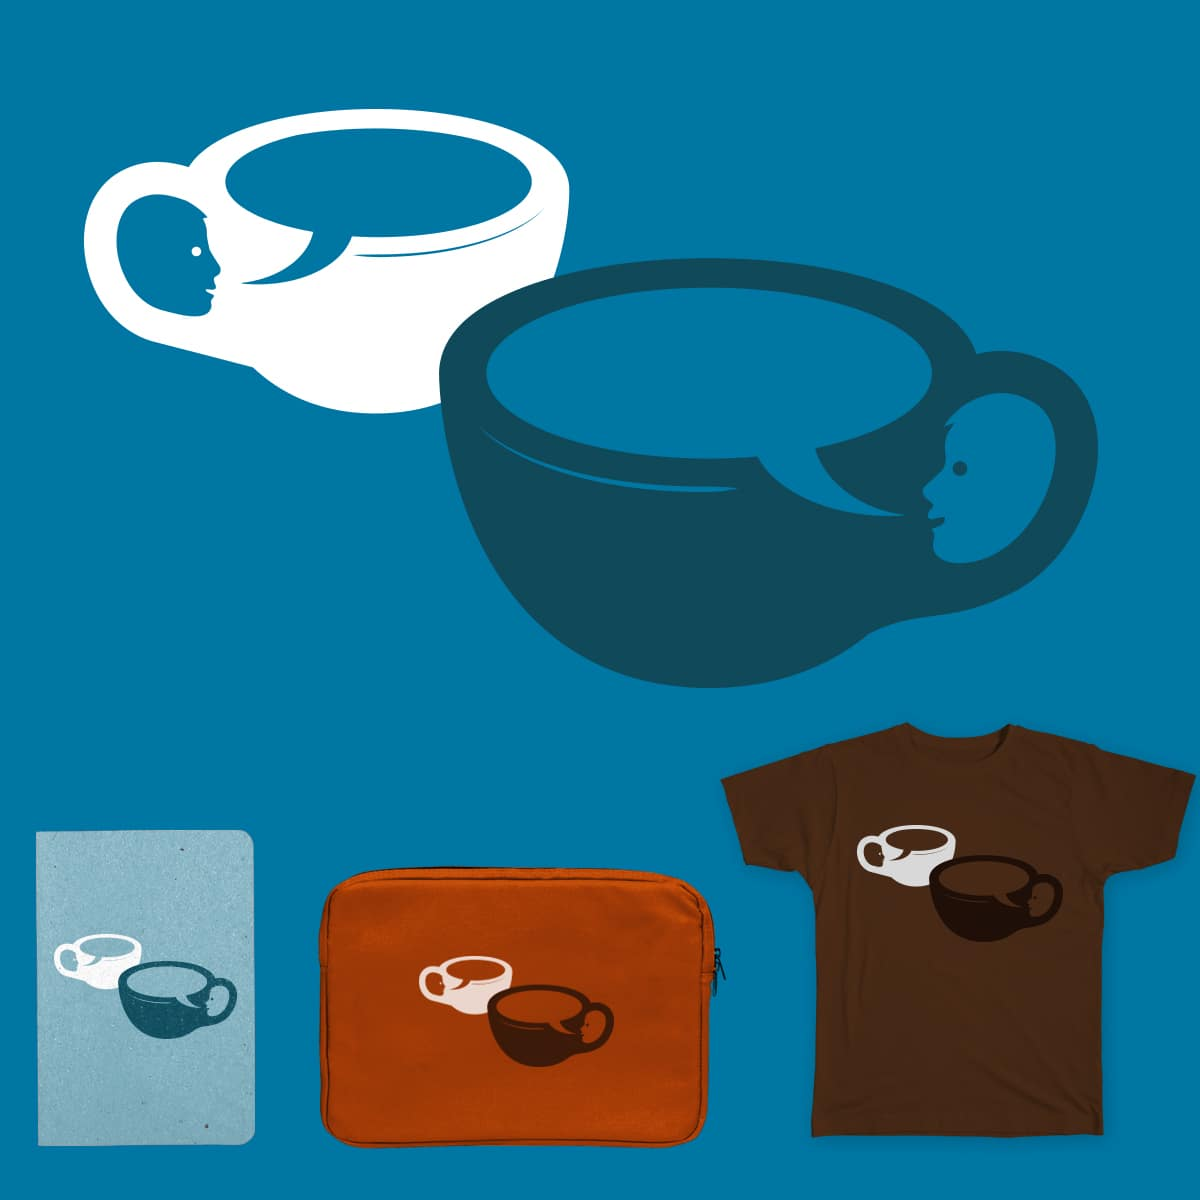 Cup O'Conversation by NorbiDemeter on Threadless